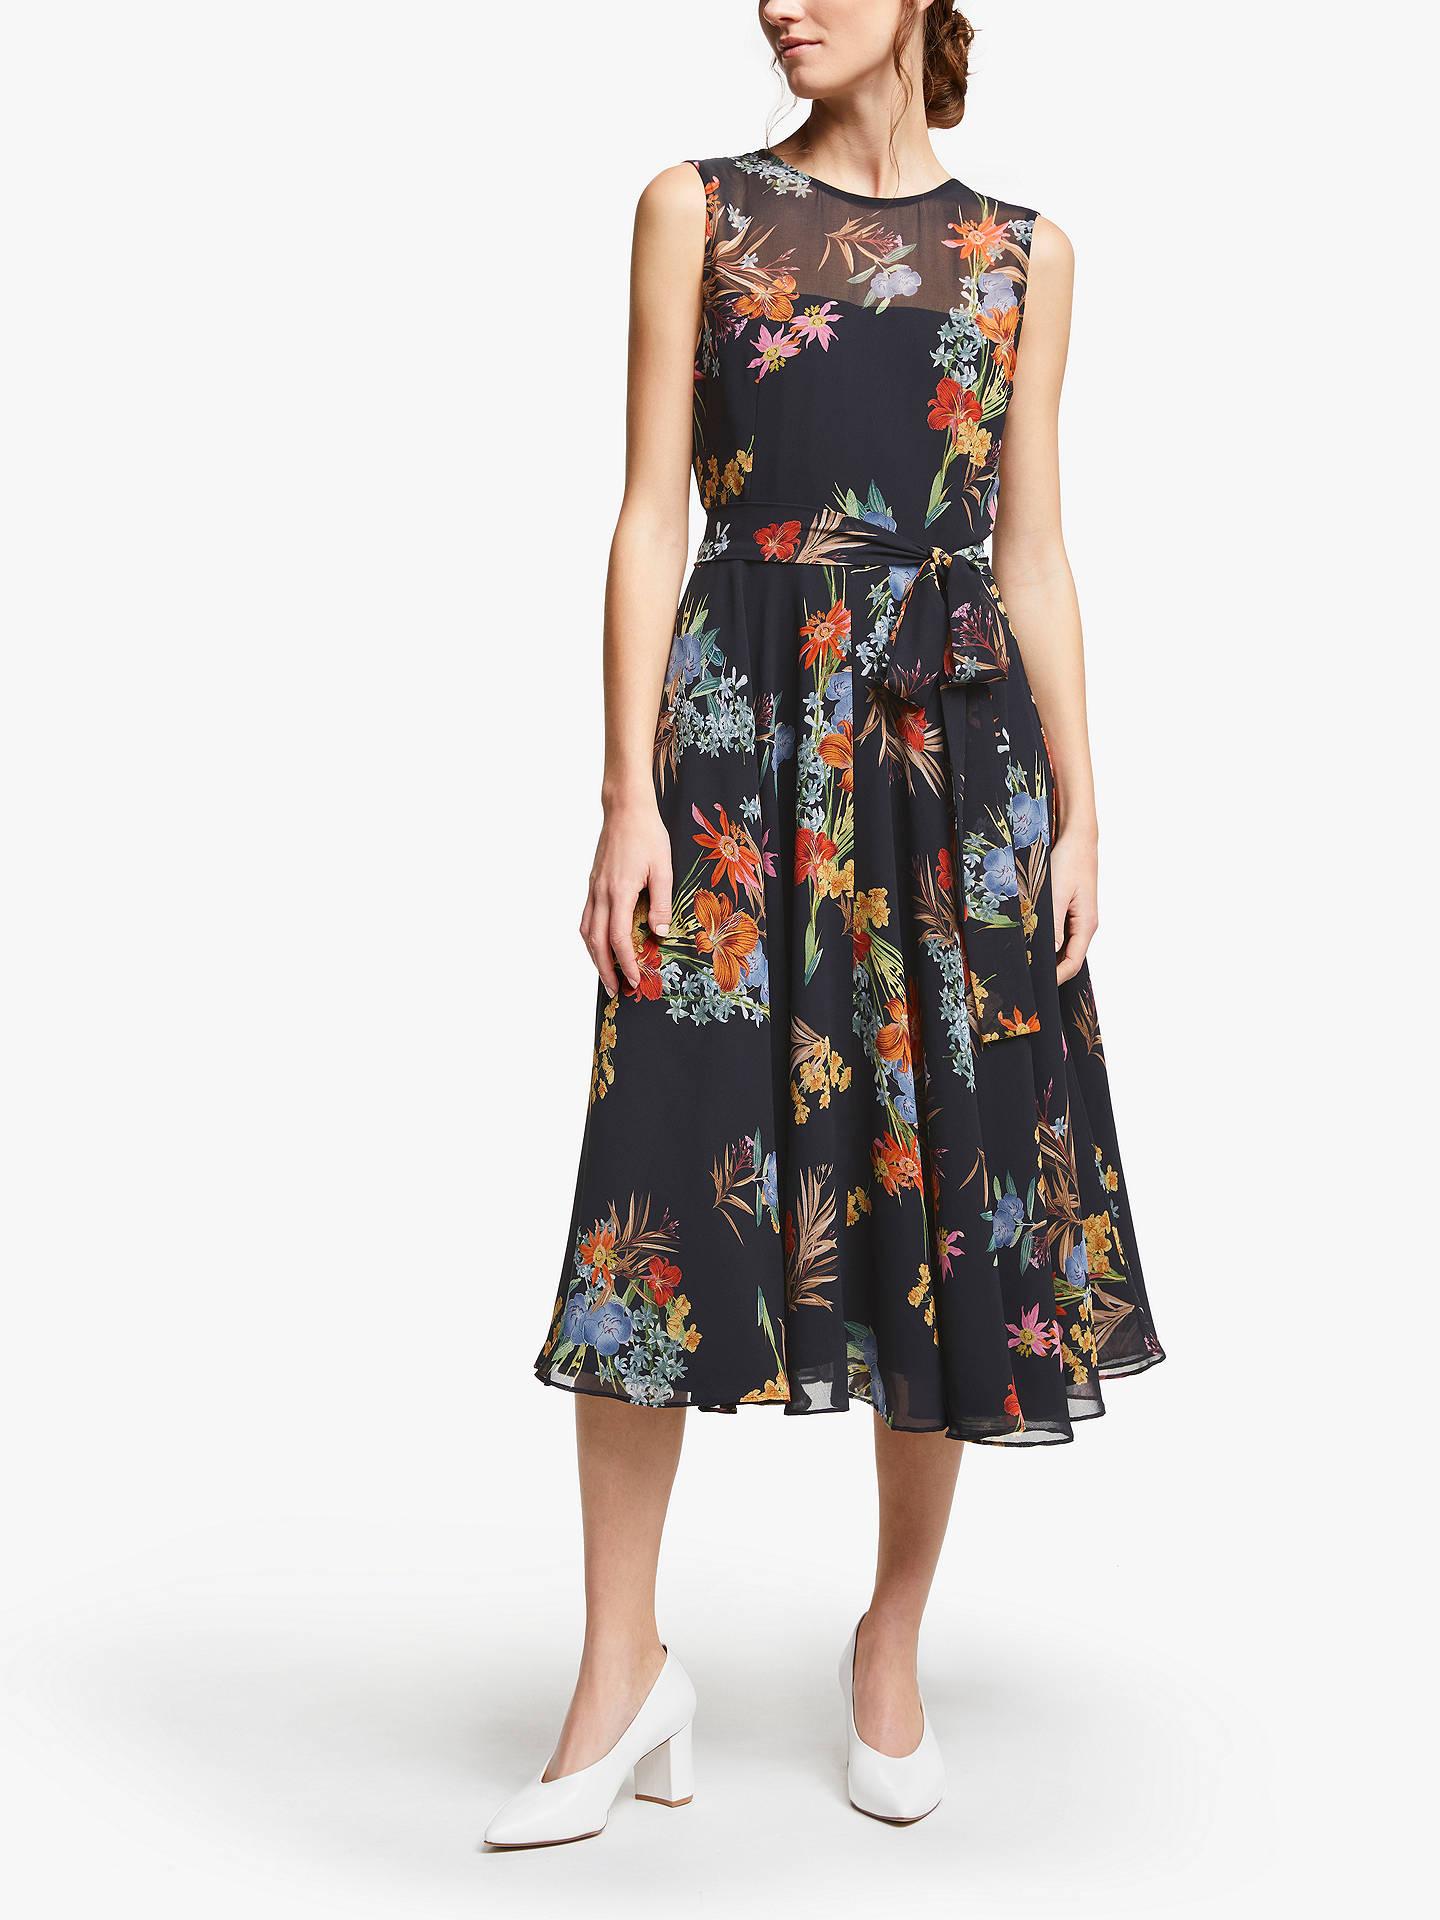 Marella Pinta Floral Print Dress, Black at John Lewis & Partners